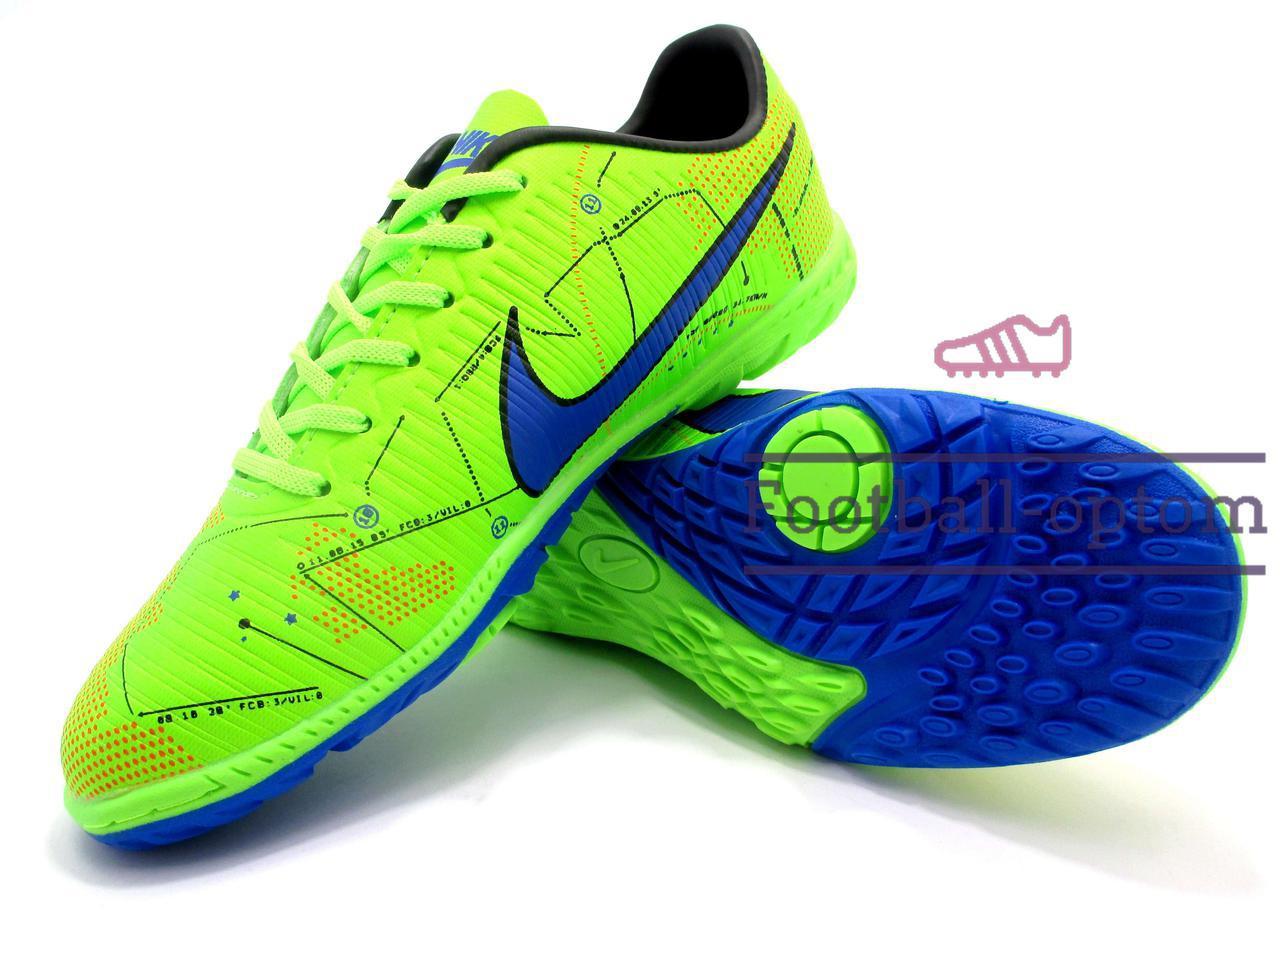 Купить Сороконожки (многошиповки) Nike Mercurial Neymar в Днепре от ... 3c11cc8a98dae